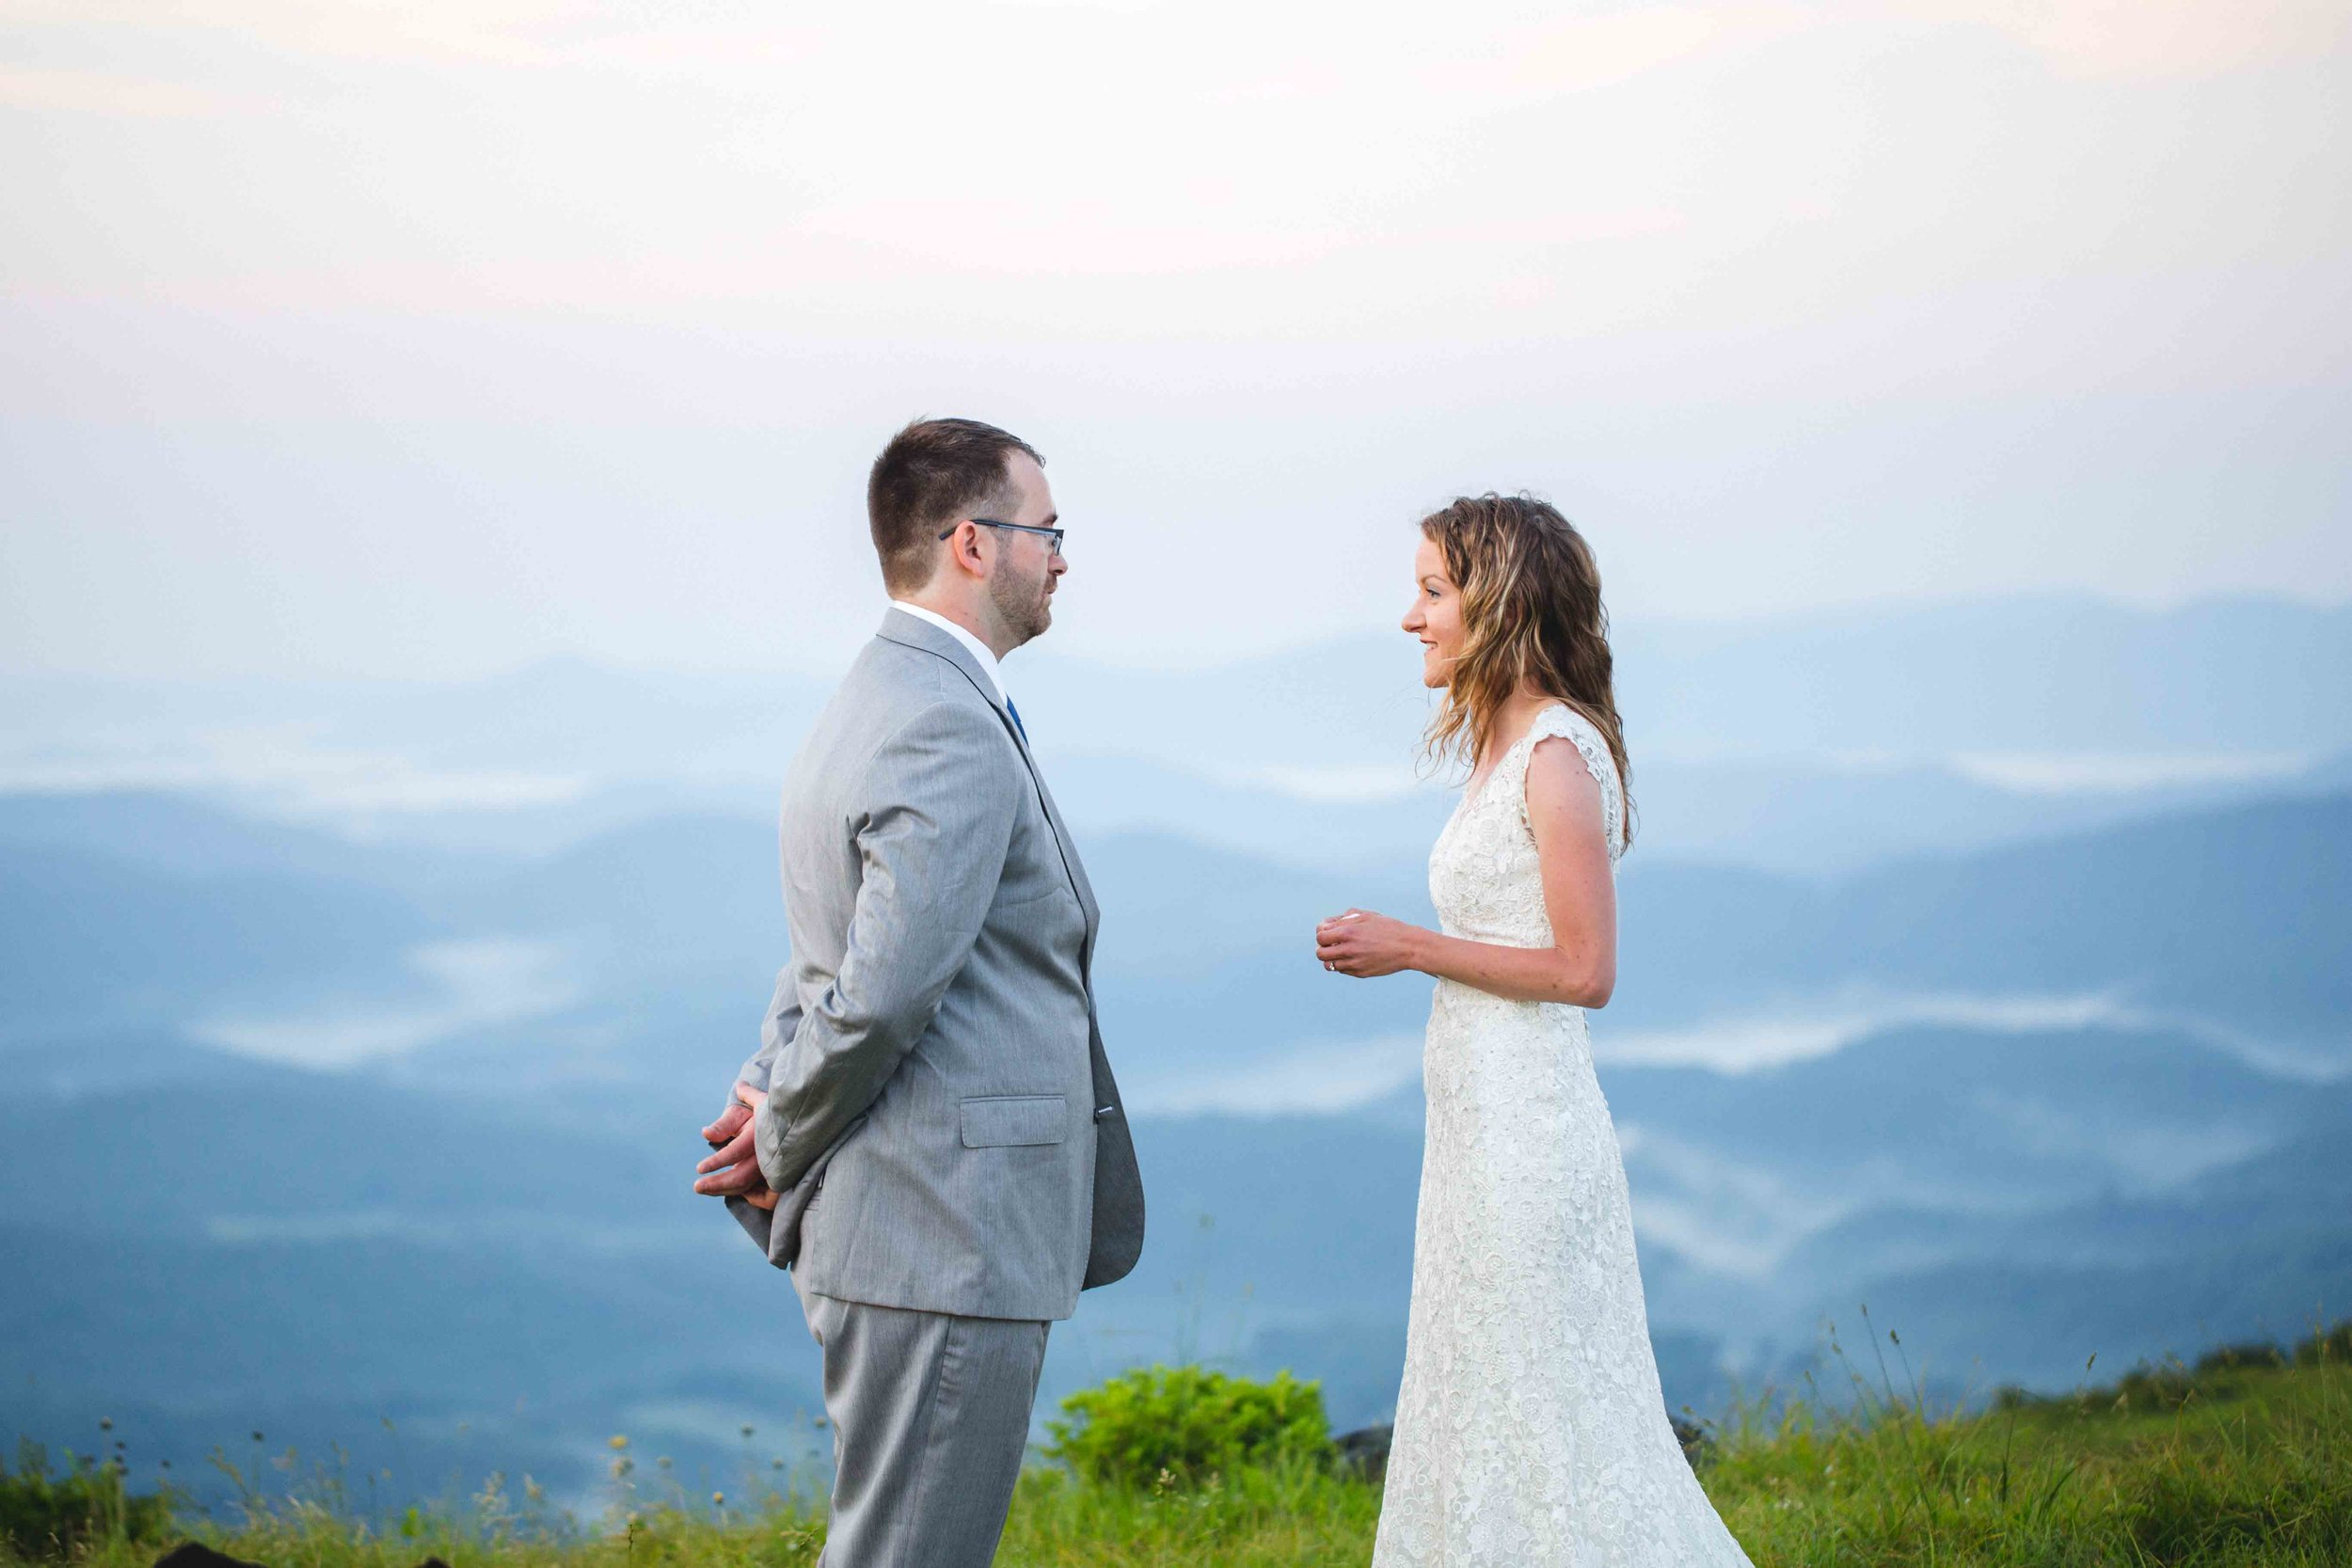 north-carolina-elopement-photographer-29.jpg